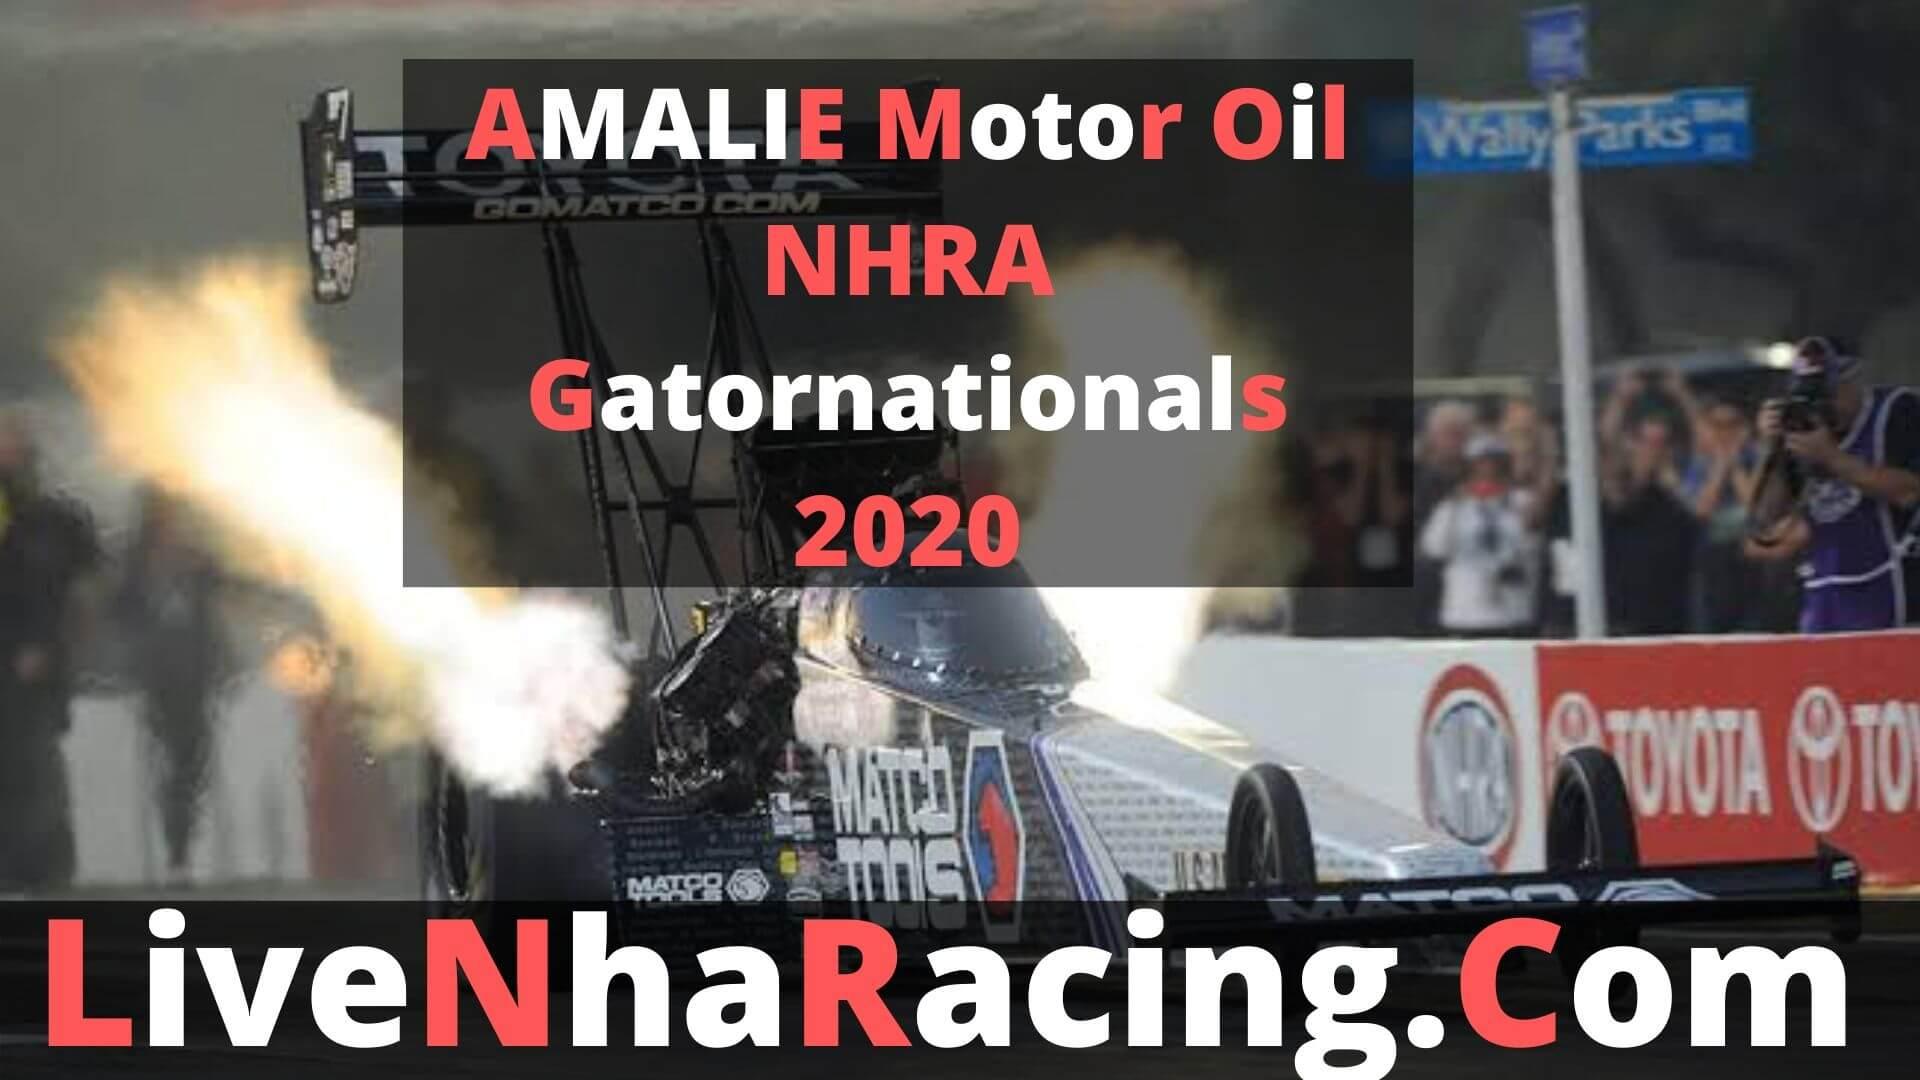 nhra-live-stream-amalie-gatornationals